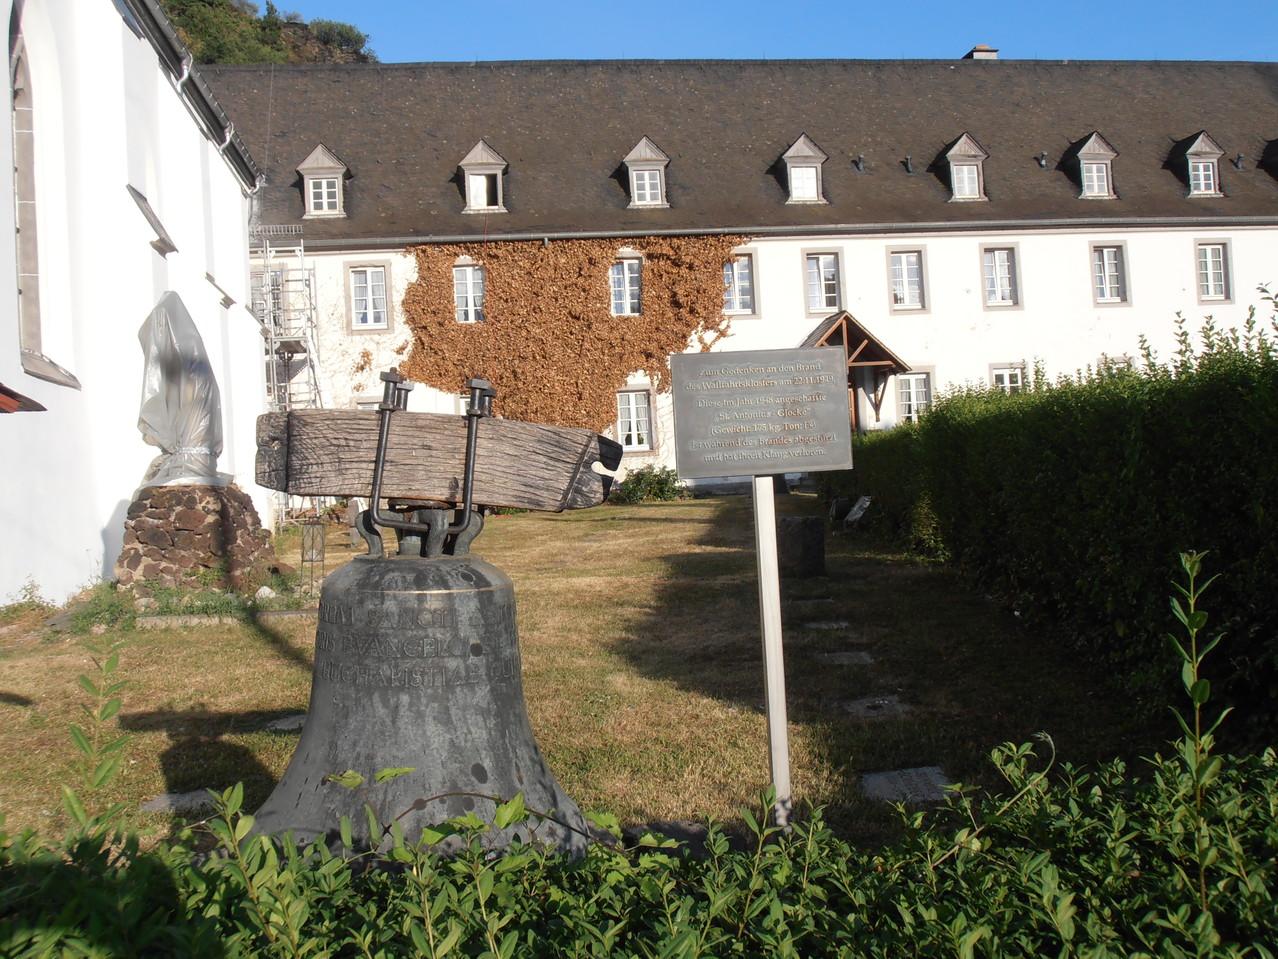 Auf dem Rückweg eben am Wallfahrtskloster vorbeigeschaut